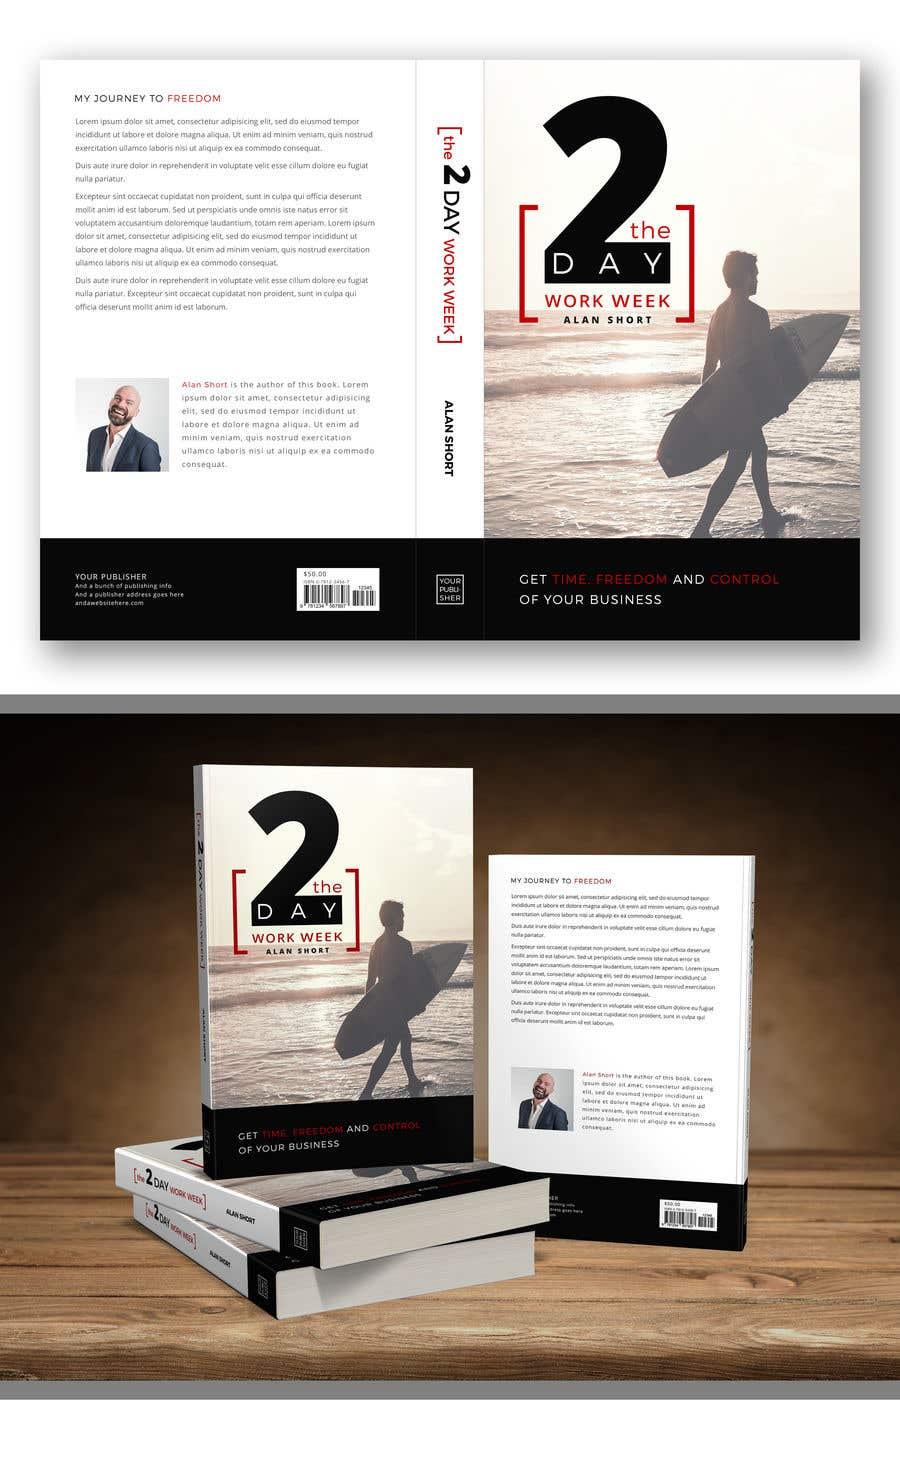 Bài tham dự cuộc thi #42 cho Book Cover 2 Day Work Week